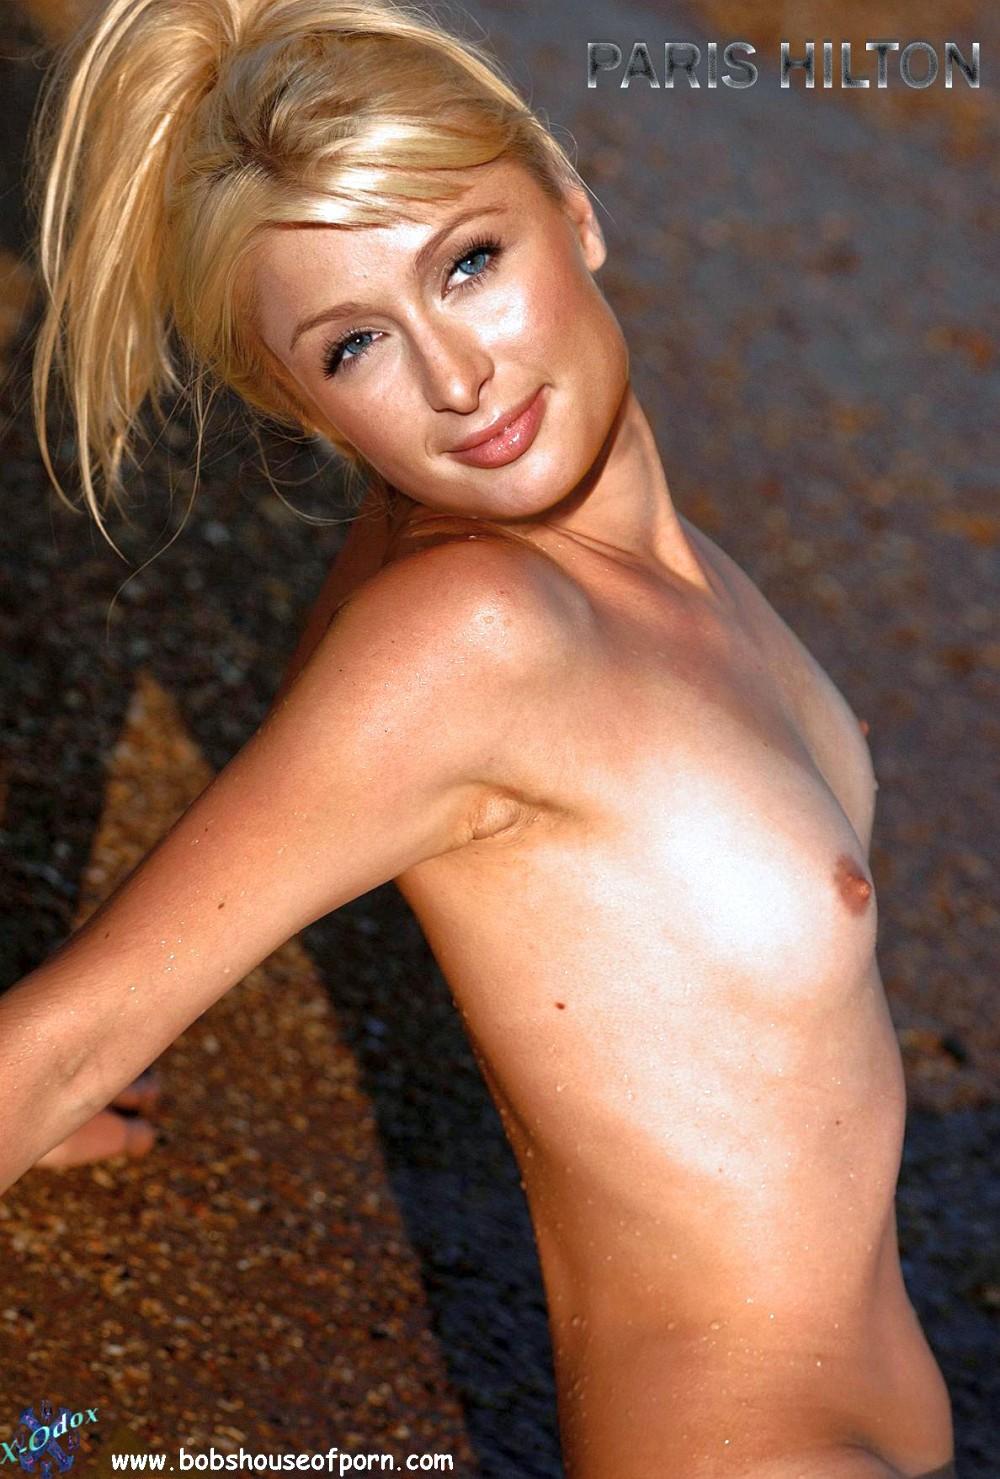 Paris Hilton Nude Pussy